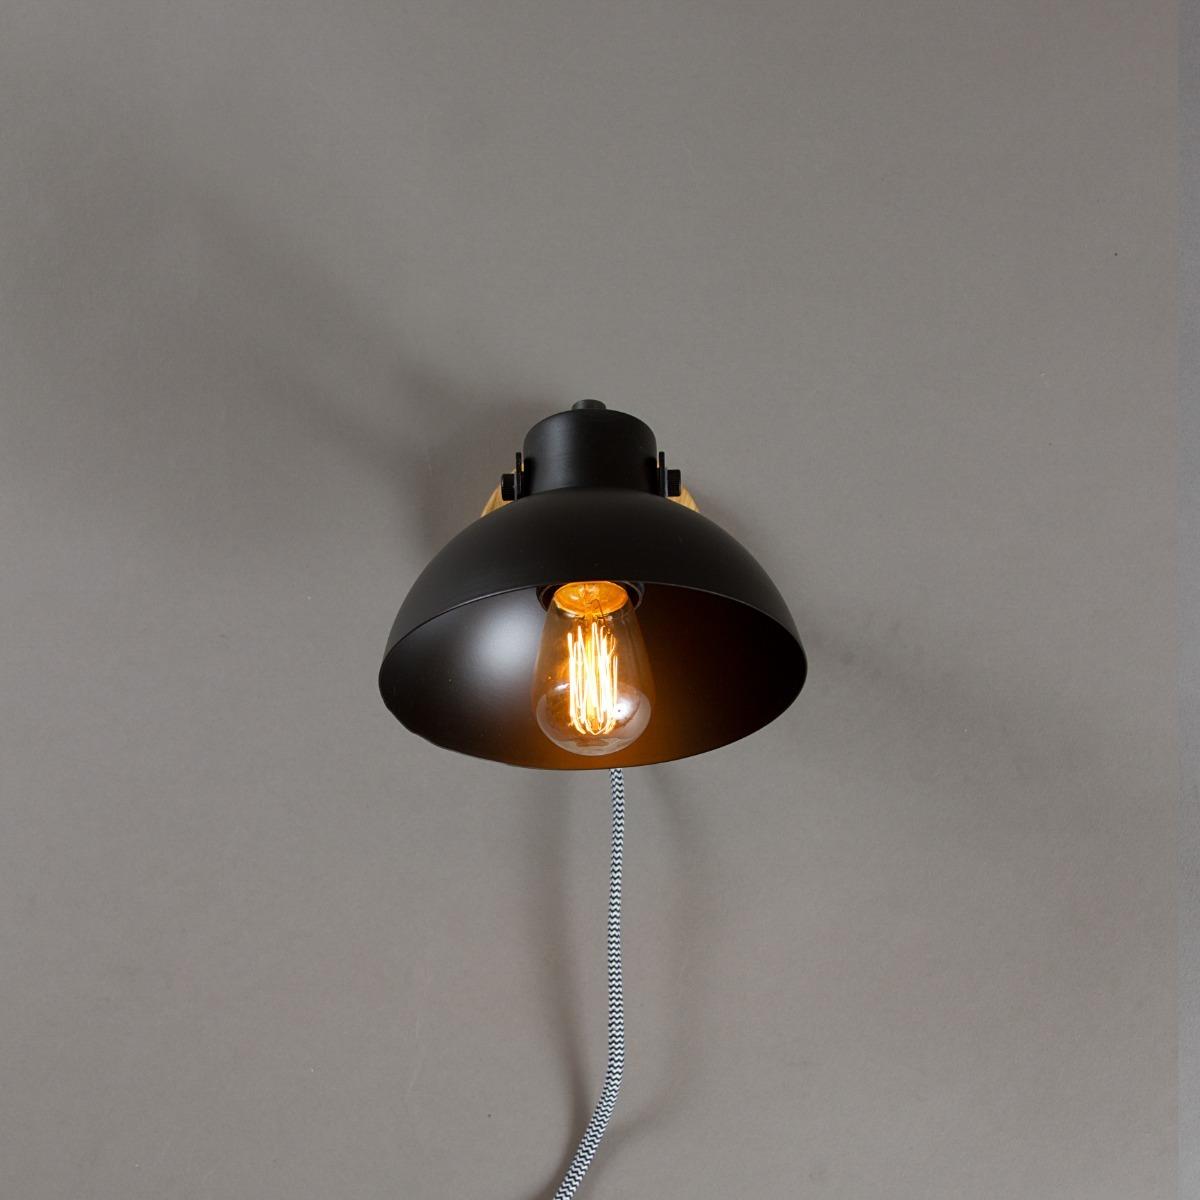 2fbfabd6186 Luminaria De Pared Negra Metal Aplique Simil Madera Zum -   1.250